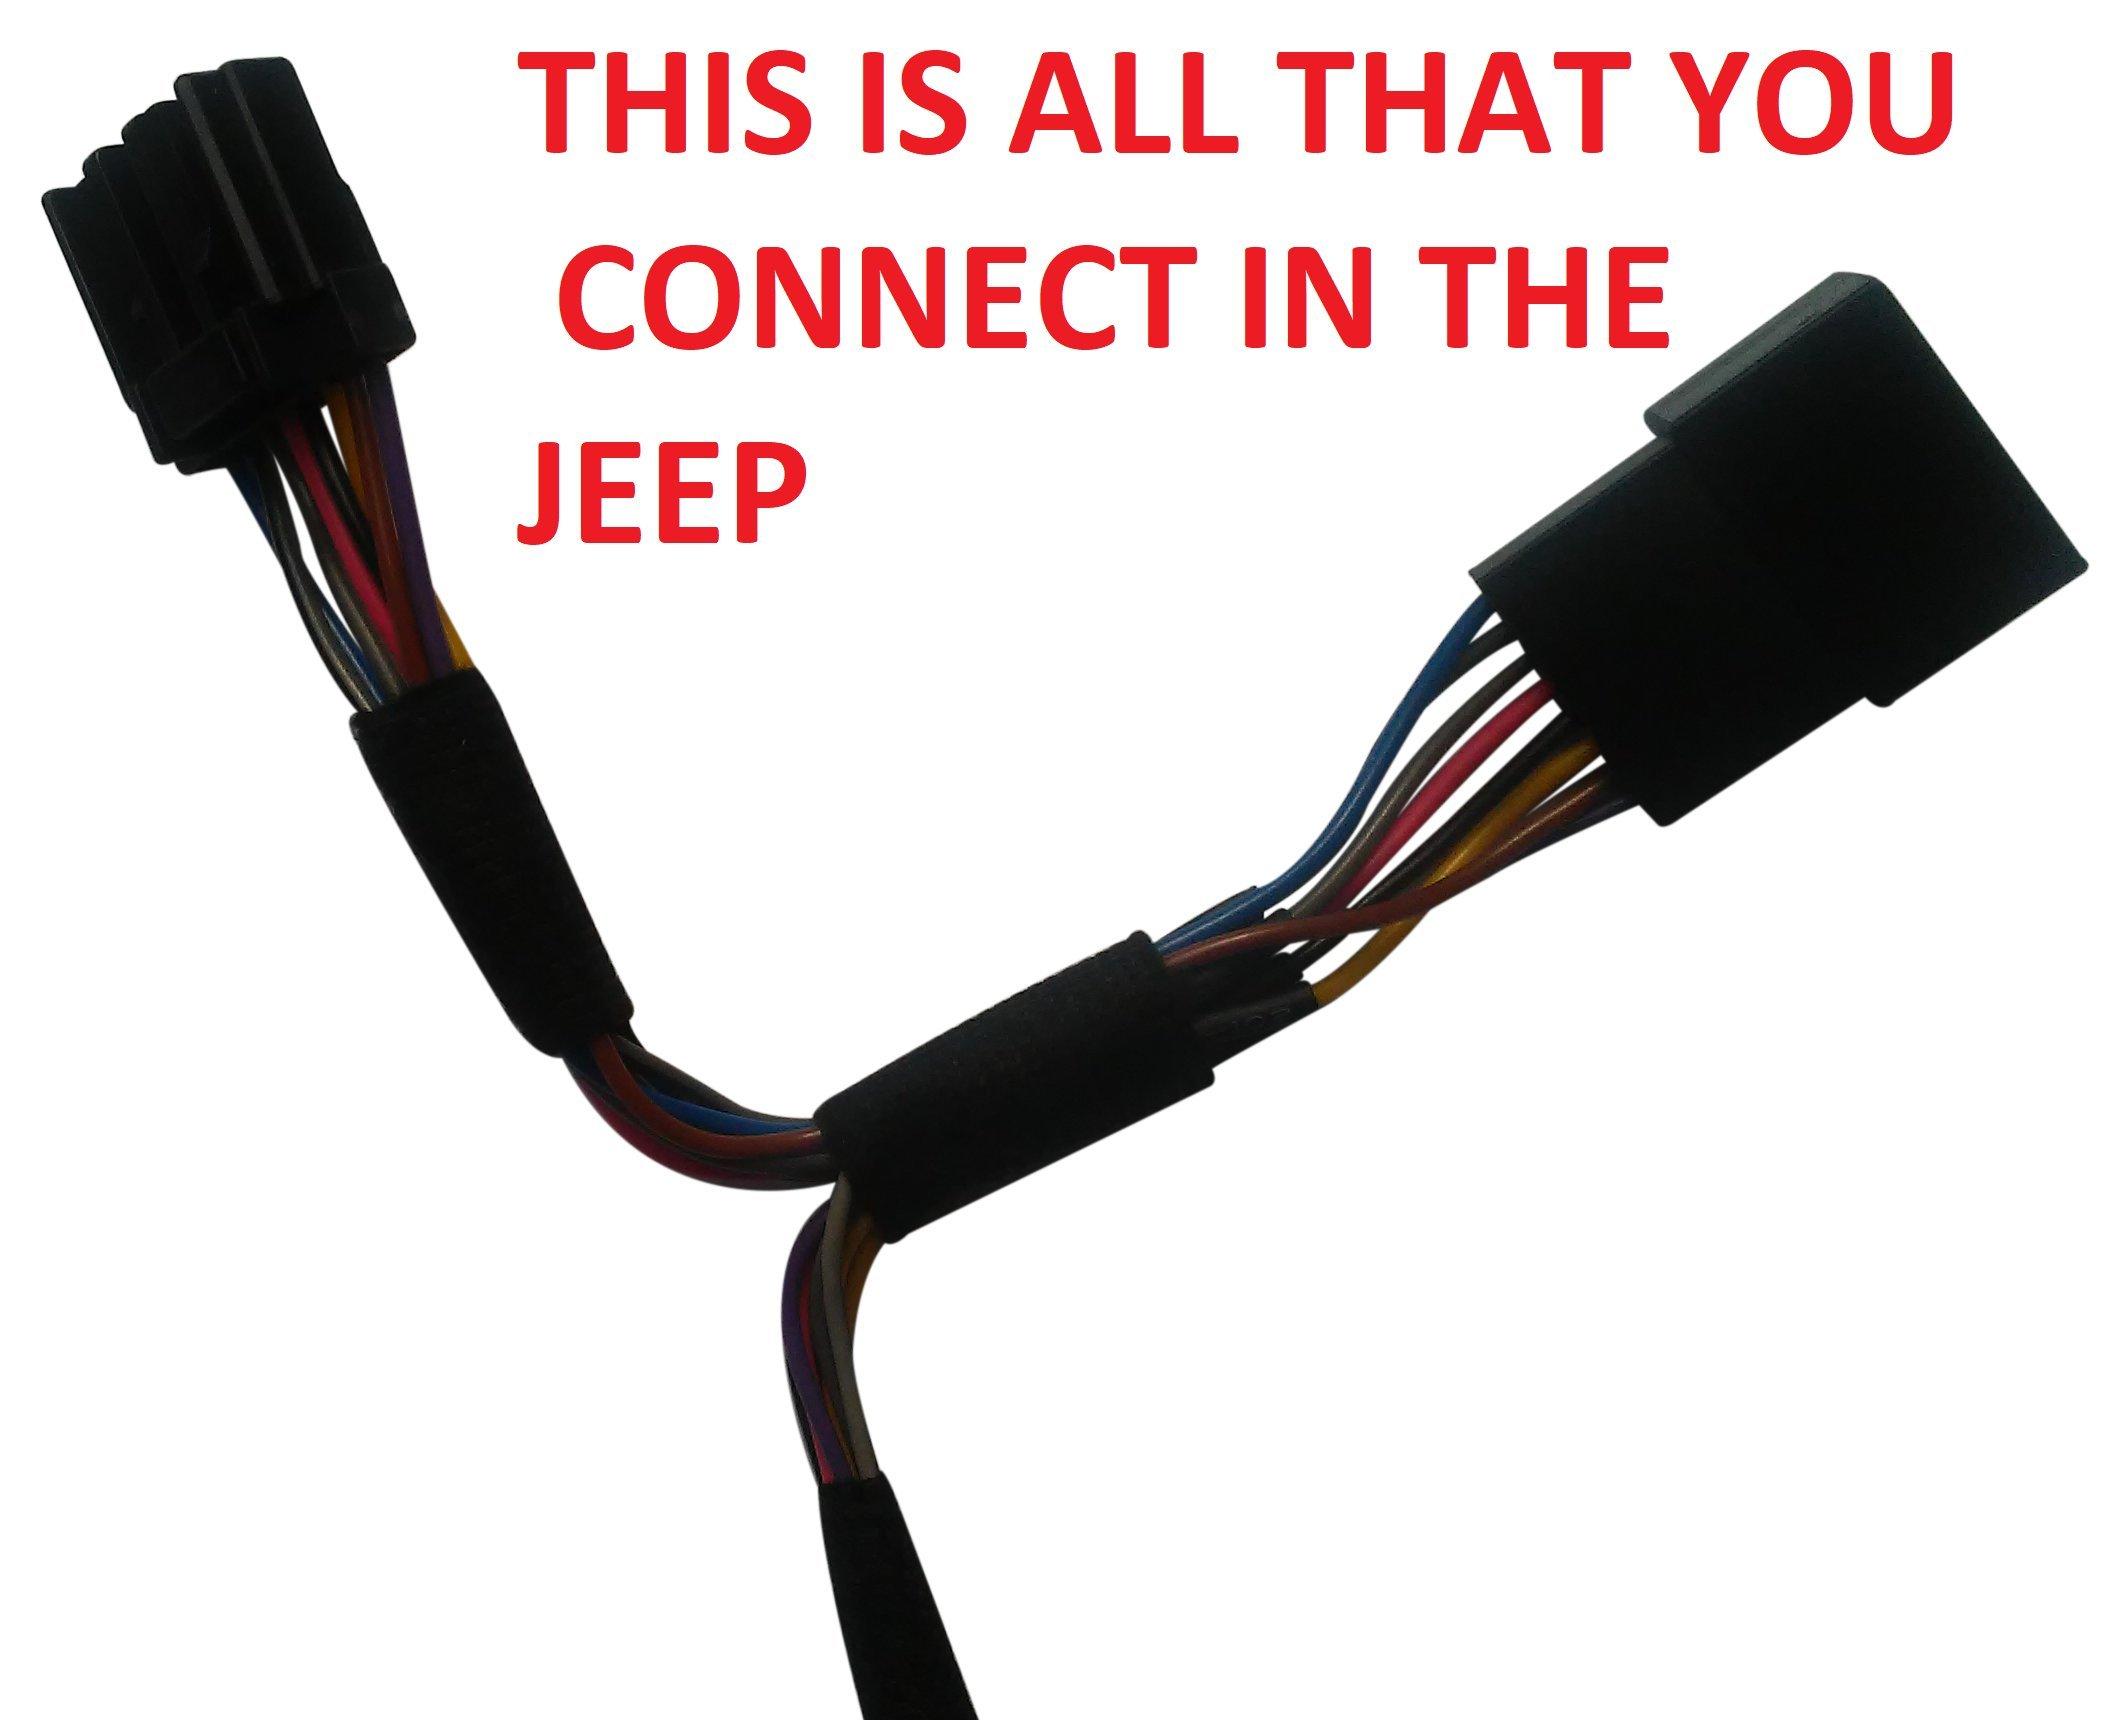 Jeep Wrangler Remote Start Starter Kit Plug & Play 2007-2018 WranglerRemoteStarter.com for a video installation